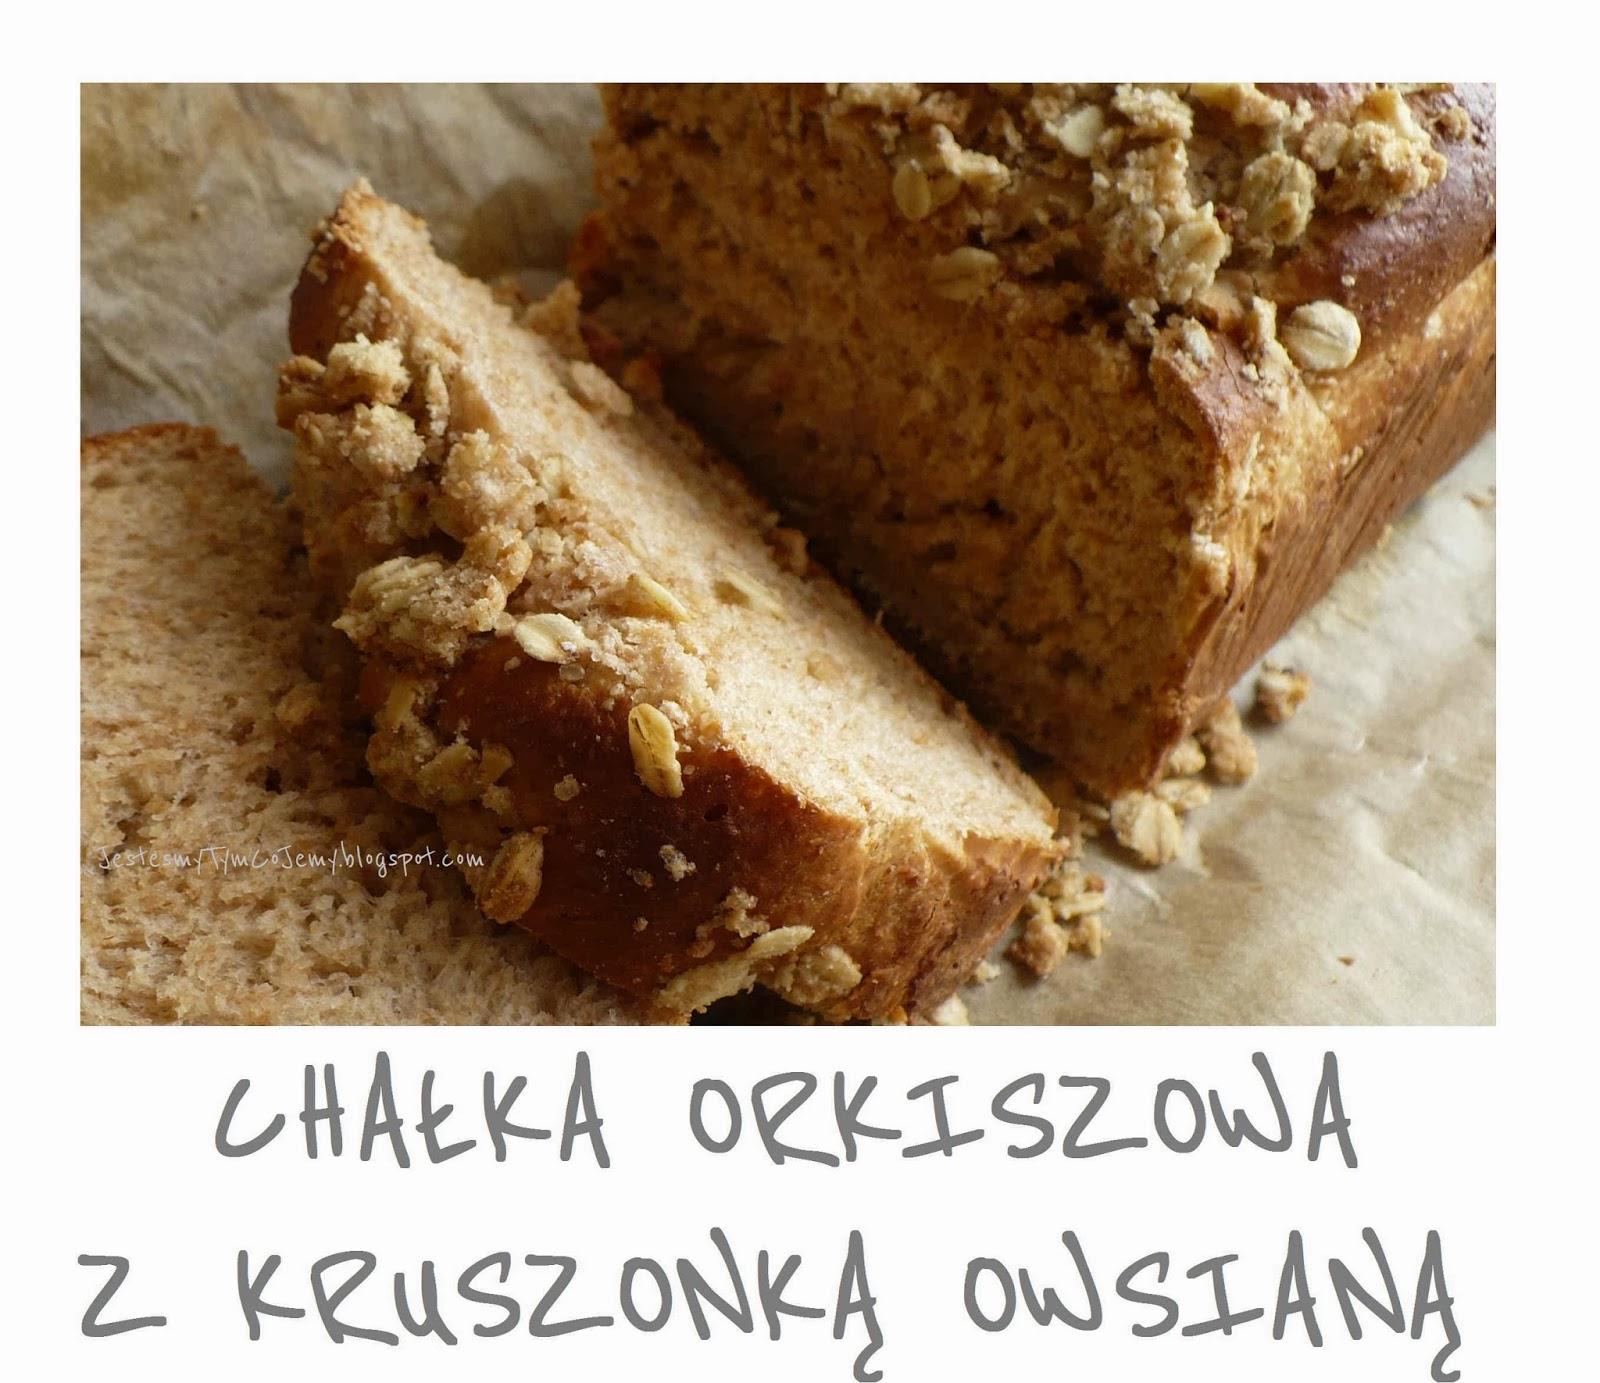 http://jestesmytymcojemy.blogspot.com/2013/10/orkiszowa-chaka-penoziarnista.html